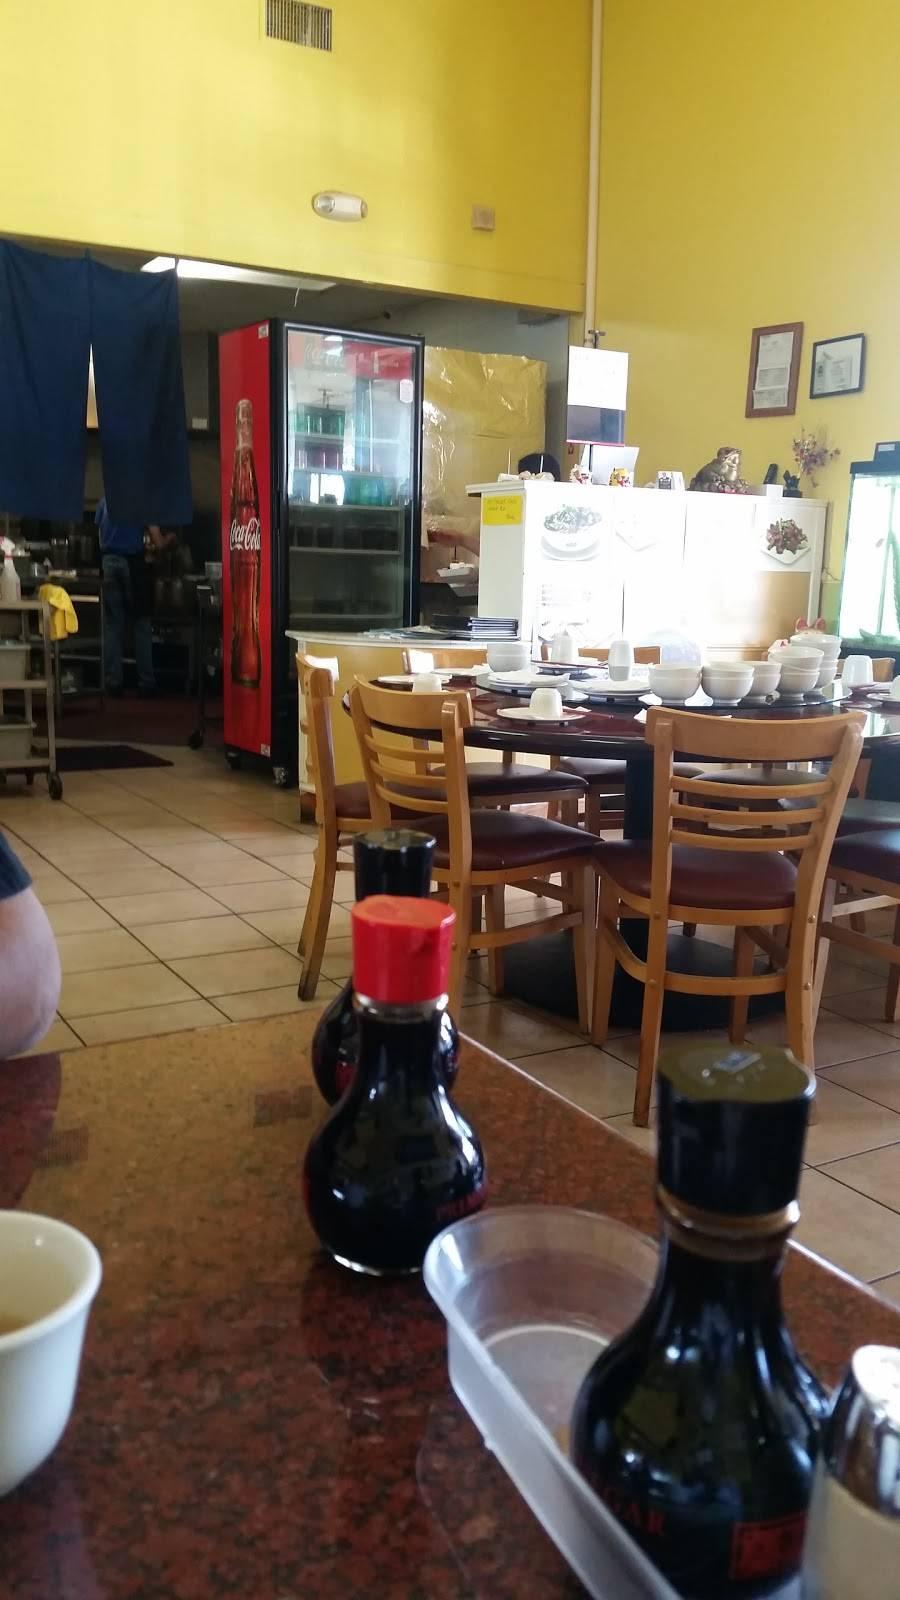 Jasmin Garden   restaurant   4205, 987 S Glendora Ave, West Covina, CA 91790, USA   6268130659 OR +1 626-813-0659